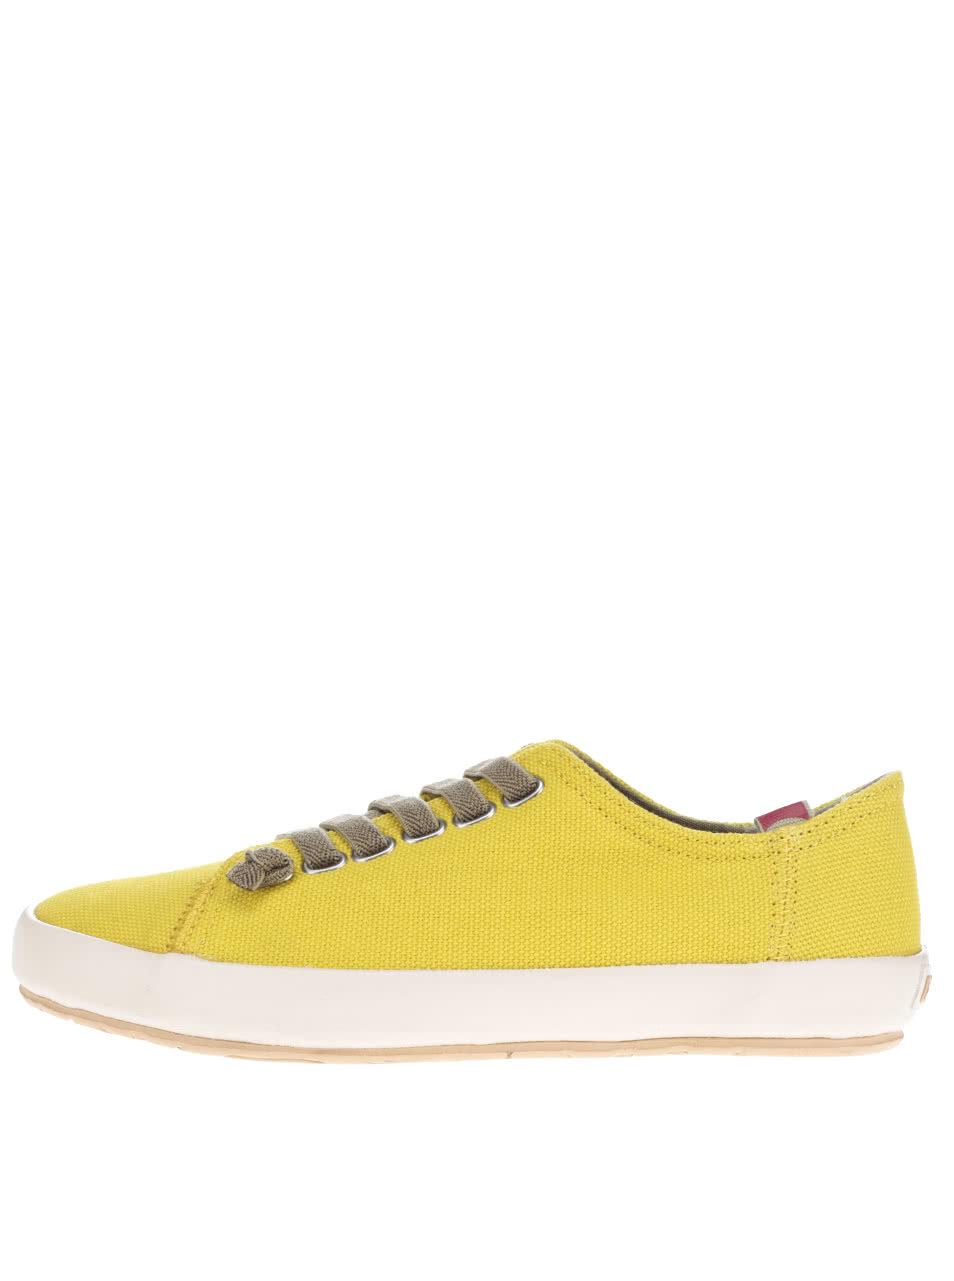 0e4969ecb3 Žlté dámske tenisky Camper ...